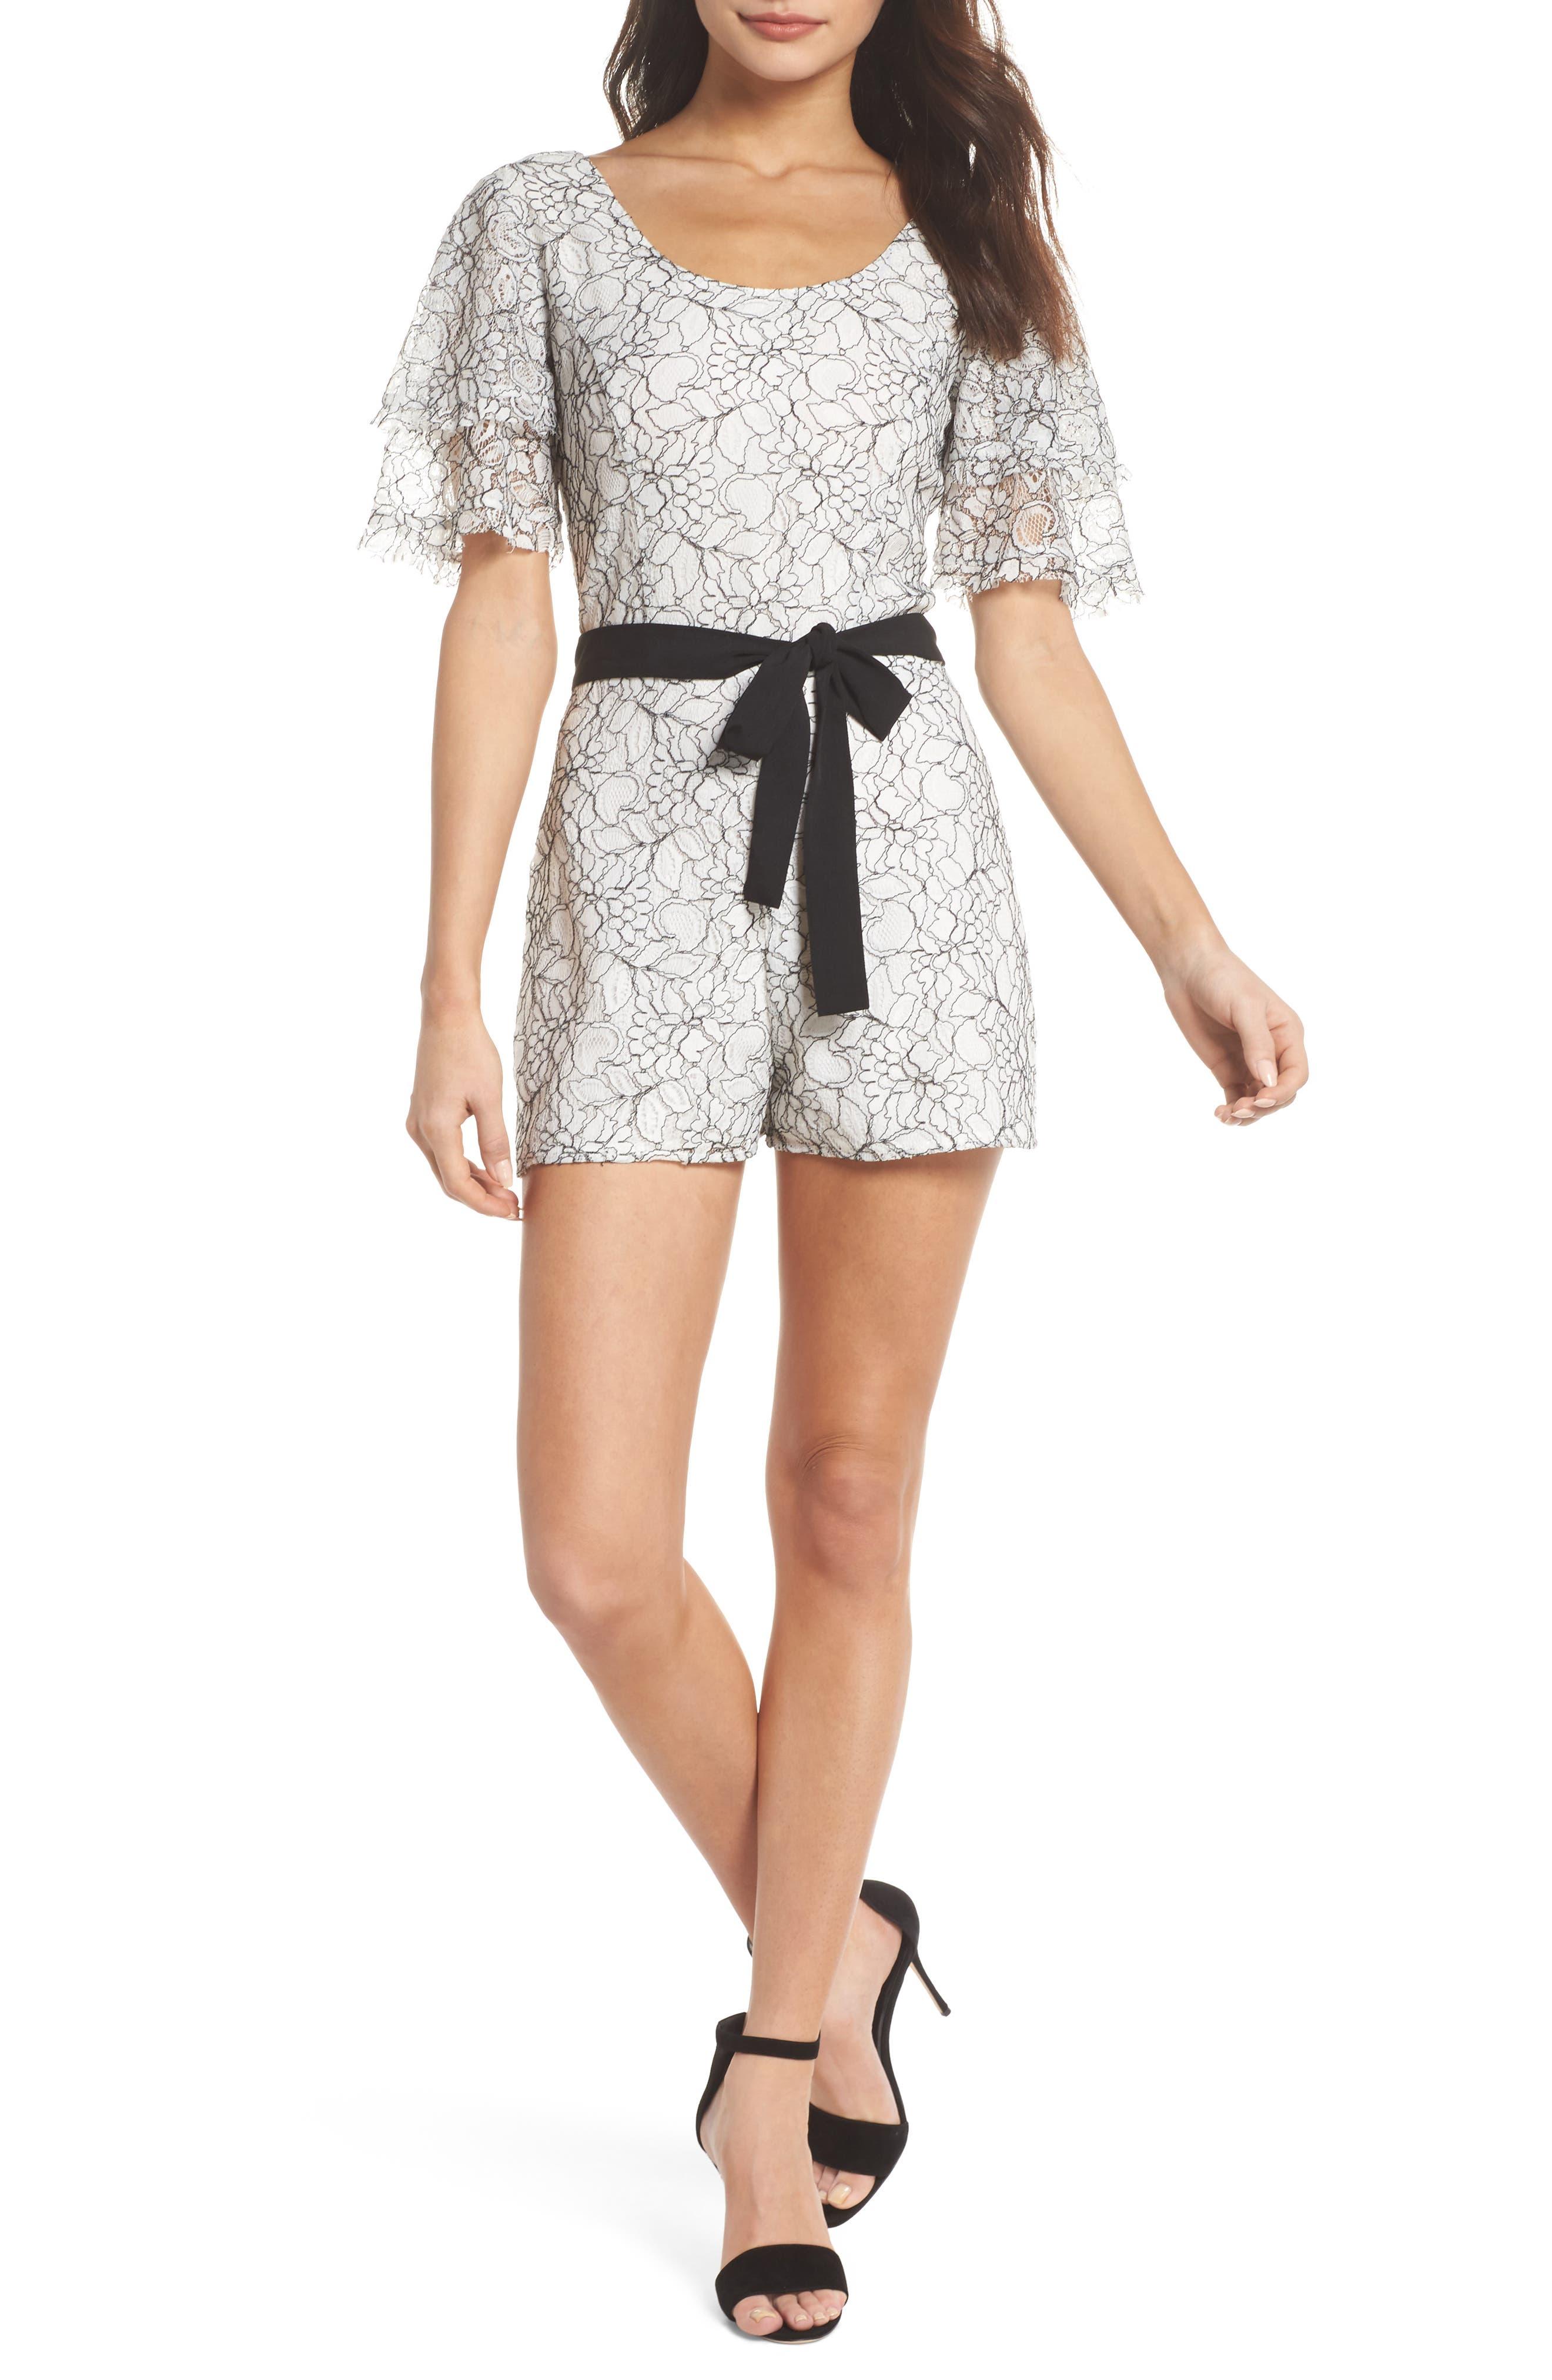 Tower Bar Lace Romper,                         Main,                         color, White/ Black Lace